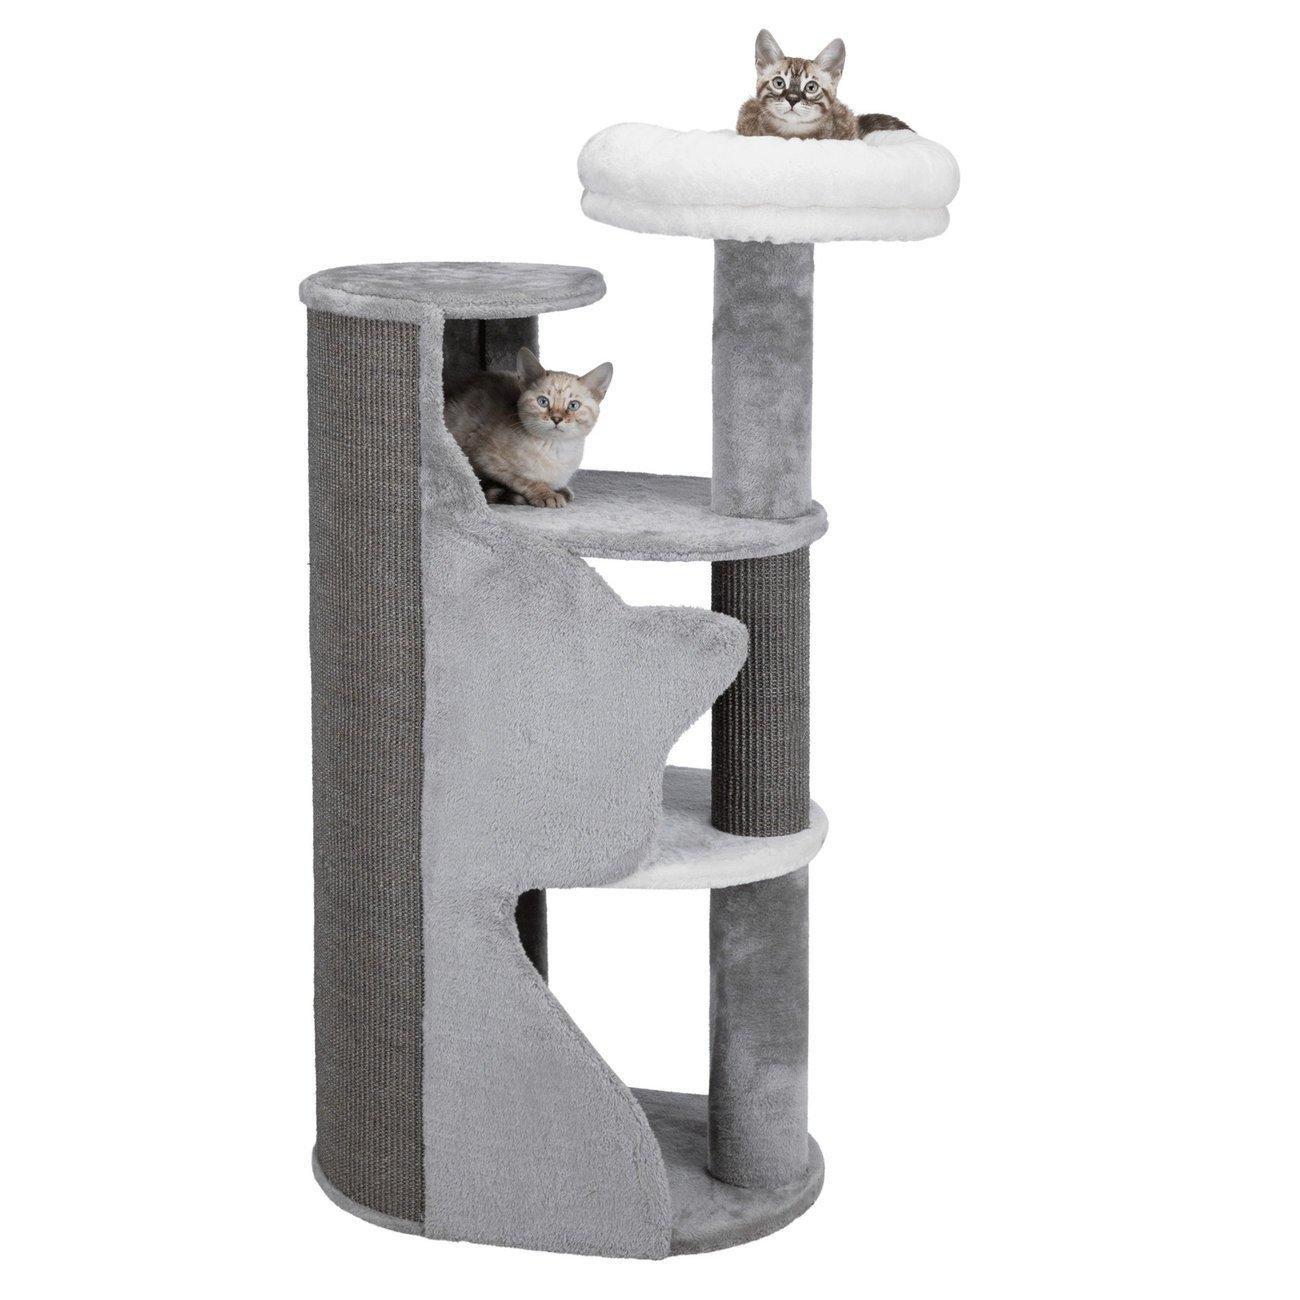 TRIXIE Kratzbaum Abele mit Katzensilhouette 44438, Bild 3